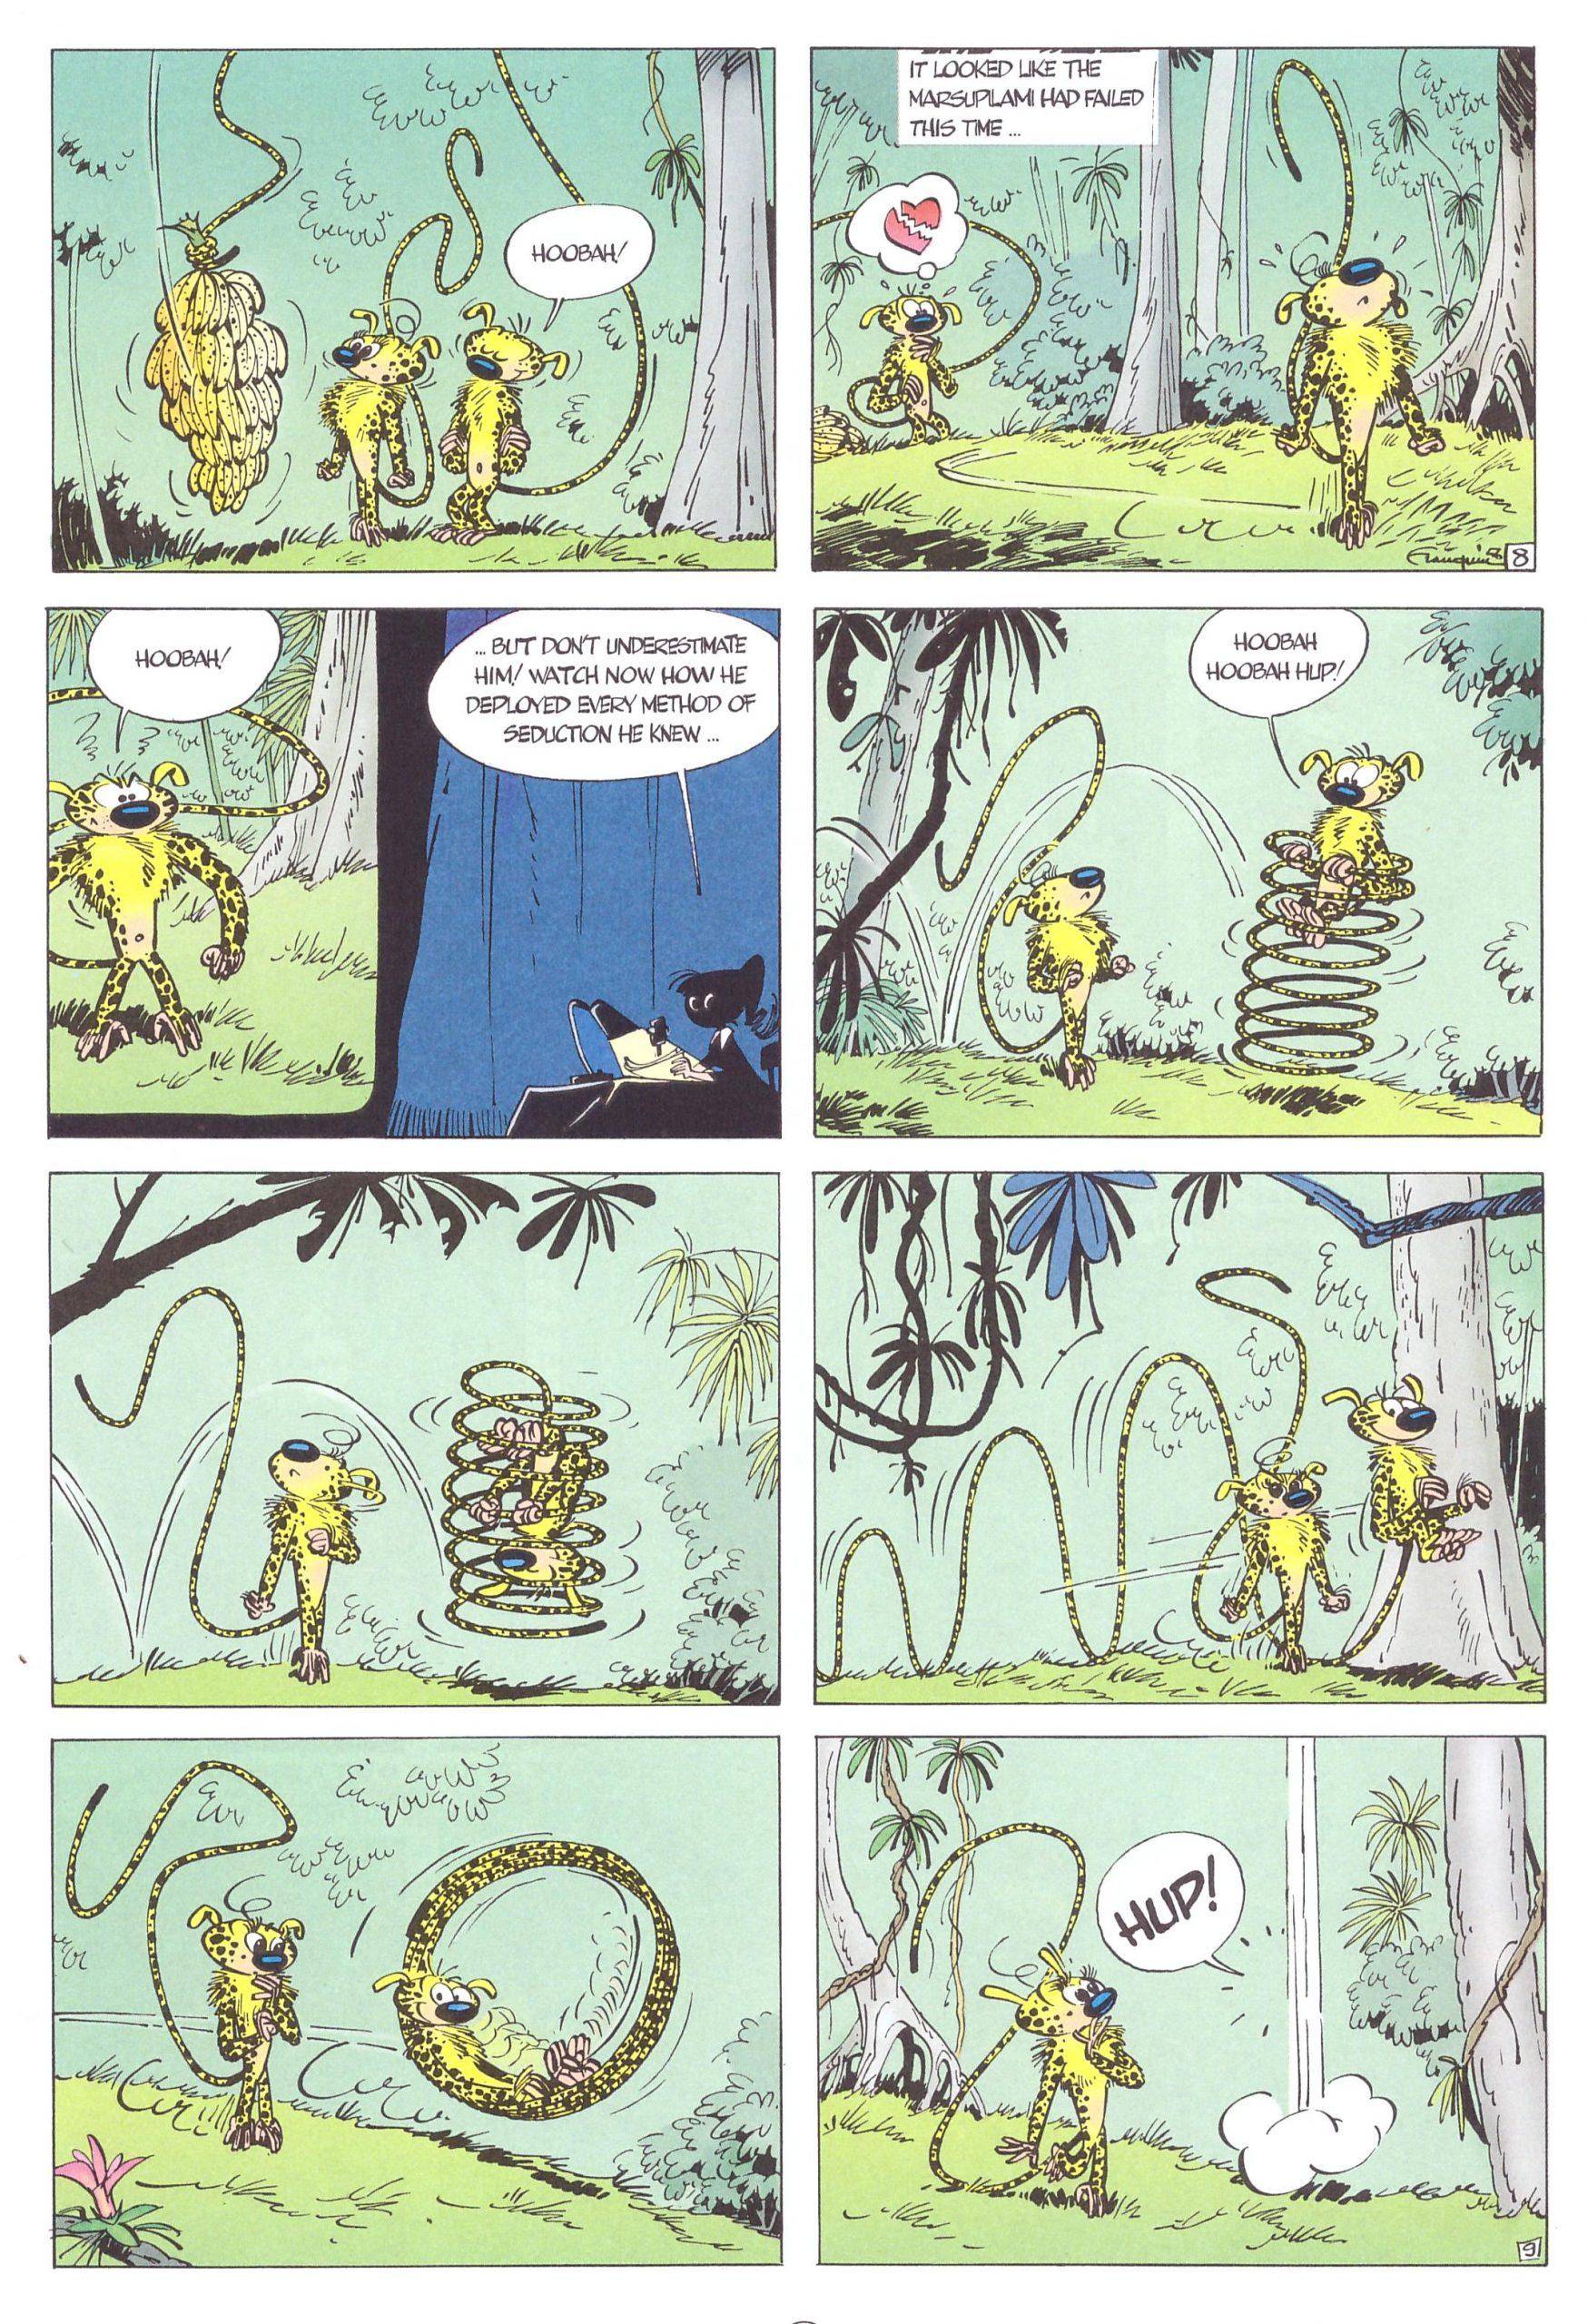 Spirou and Fantasio The Marsupilami's Nest review